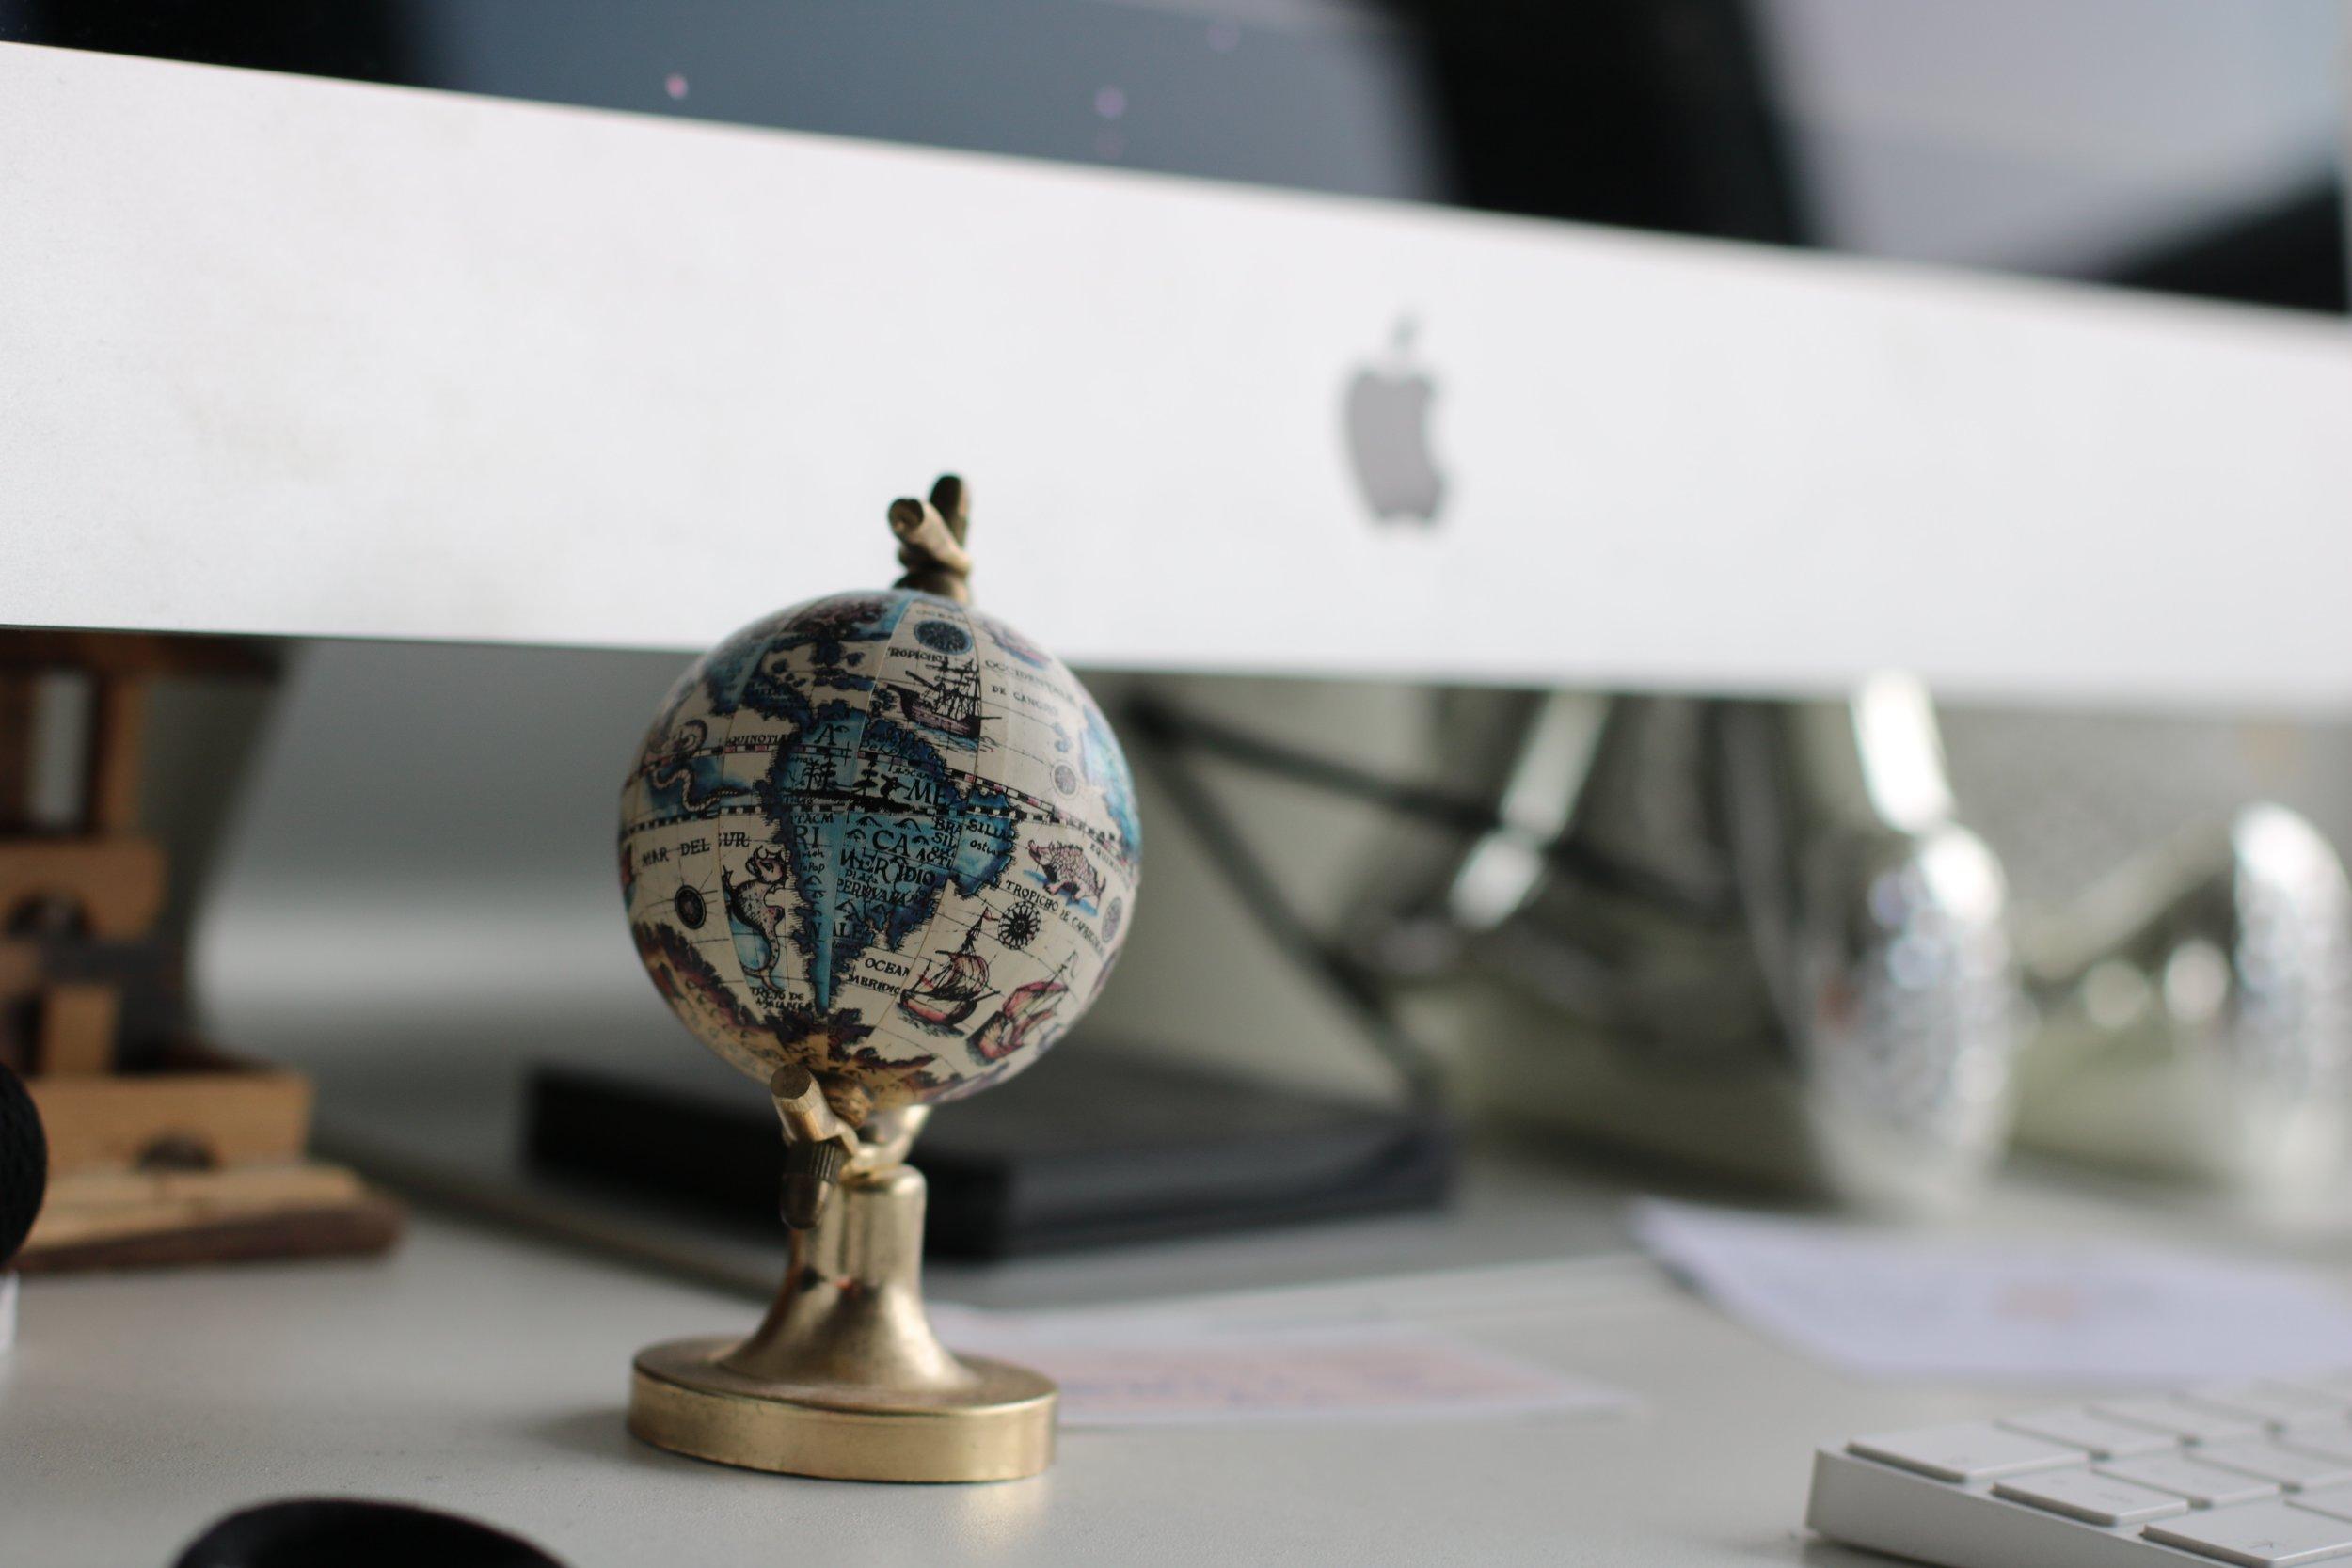 computer-cute-desk-815496.jpg